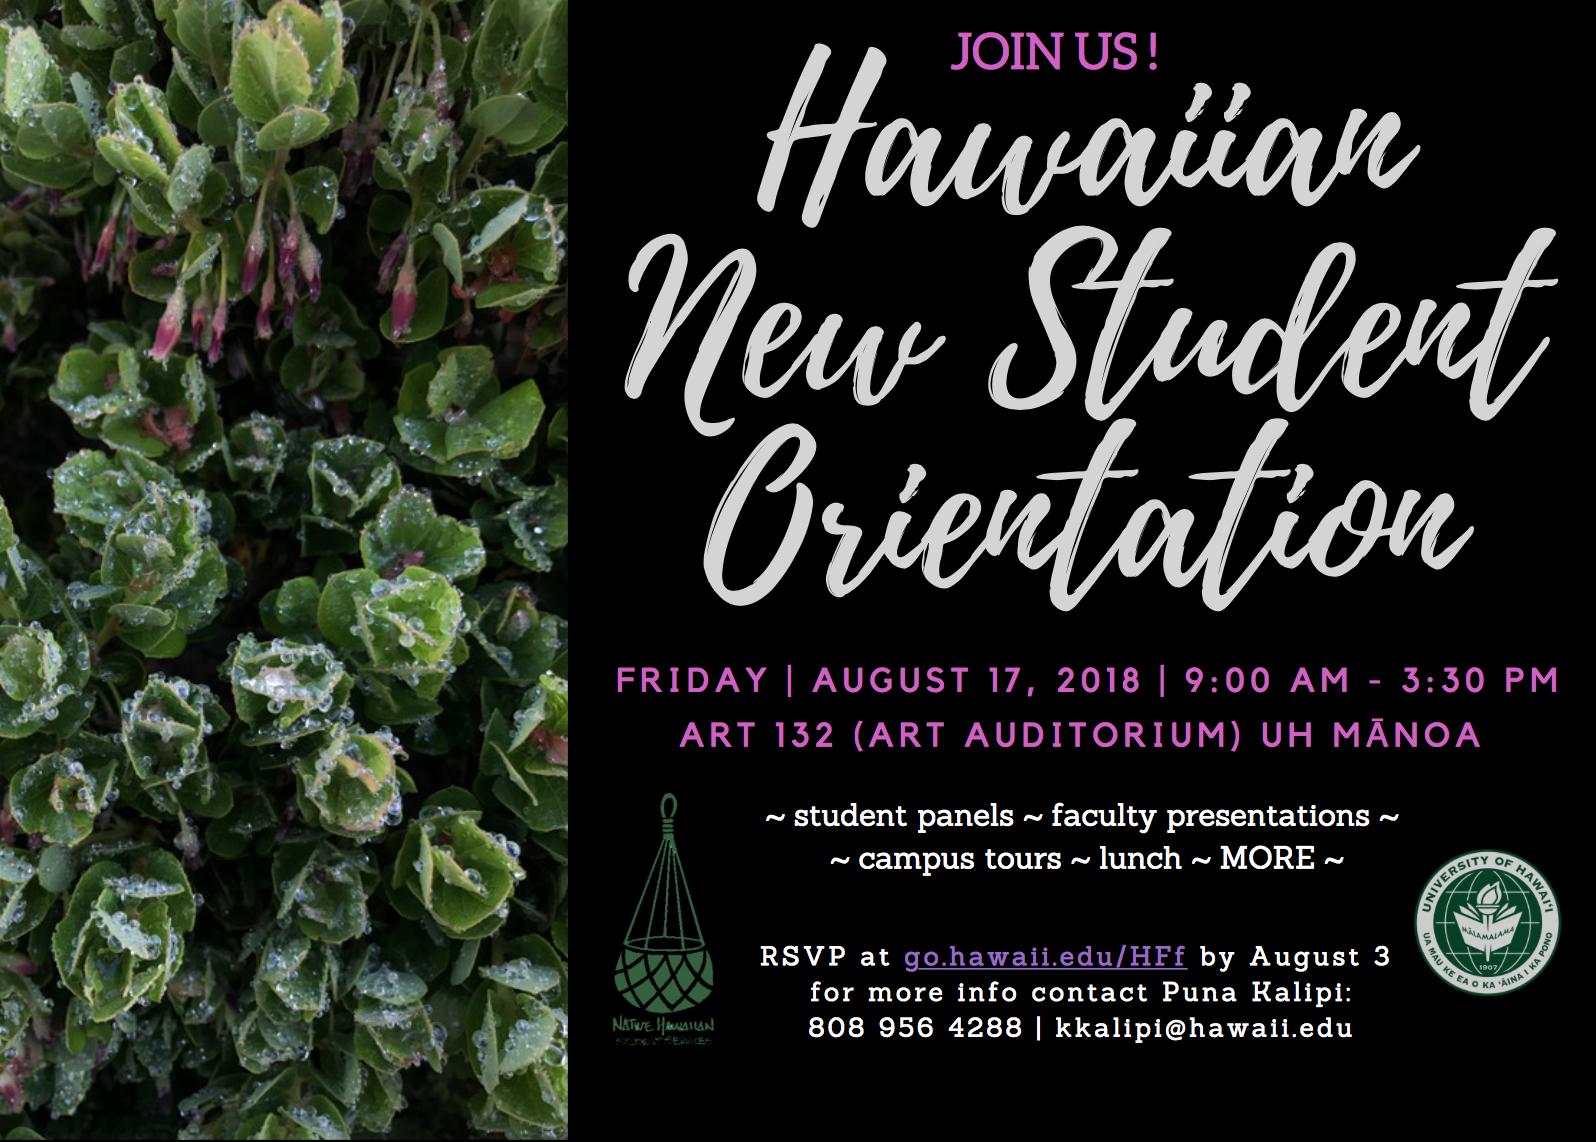 Invitation to the Hawaiian New Student Orientation